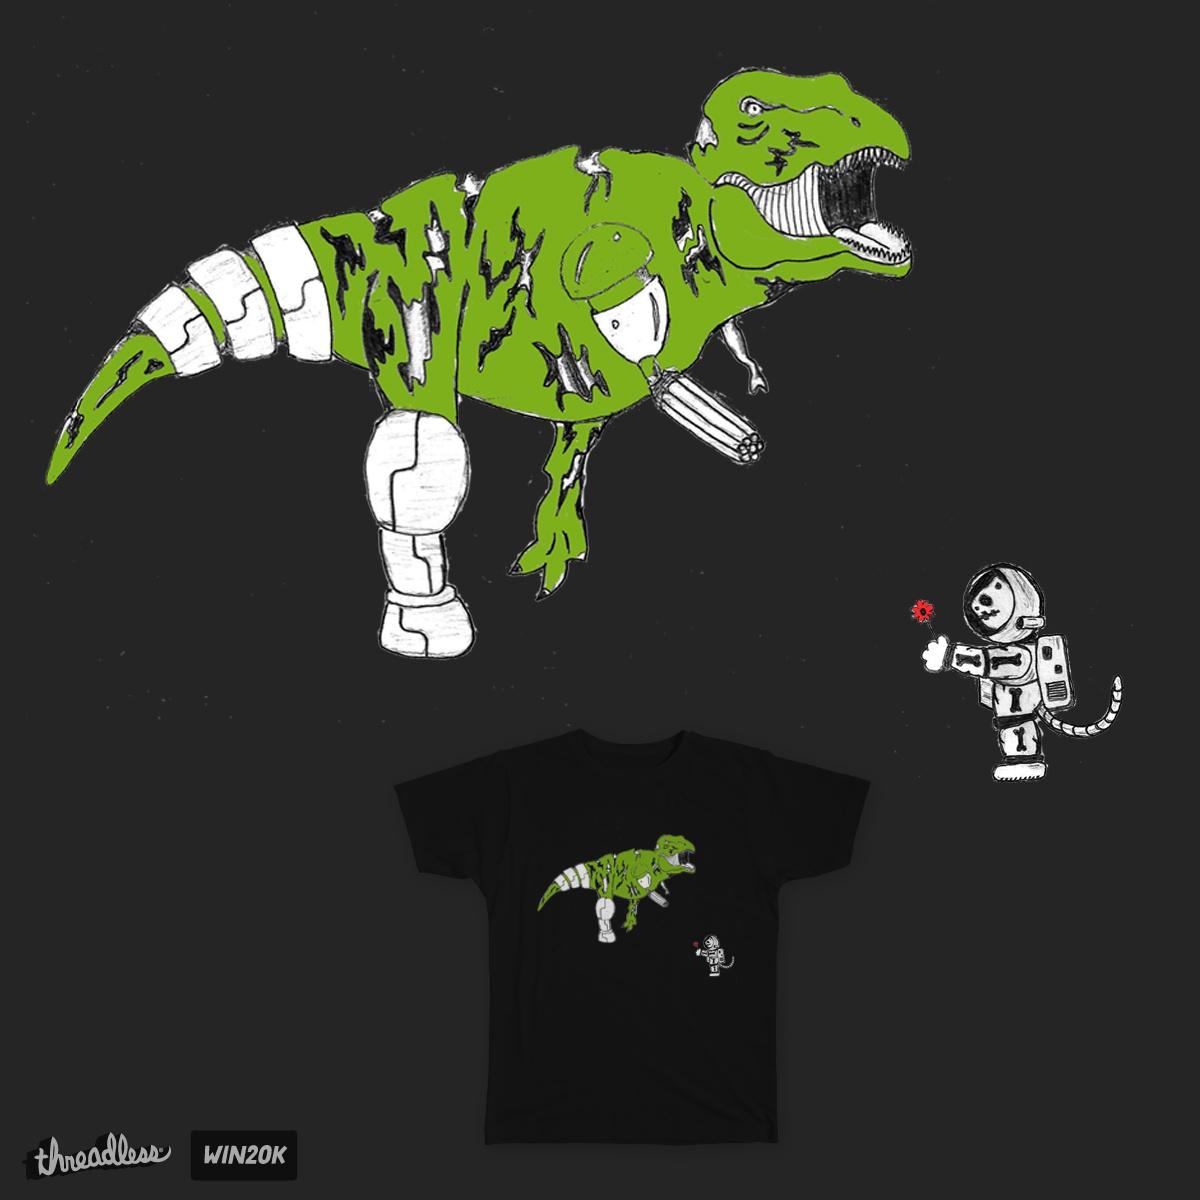 Cyborg Zombie T-Rex vs. Astro Skeleton Kitty by TRYBYK on Threadless